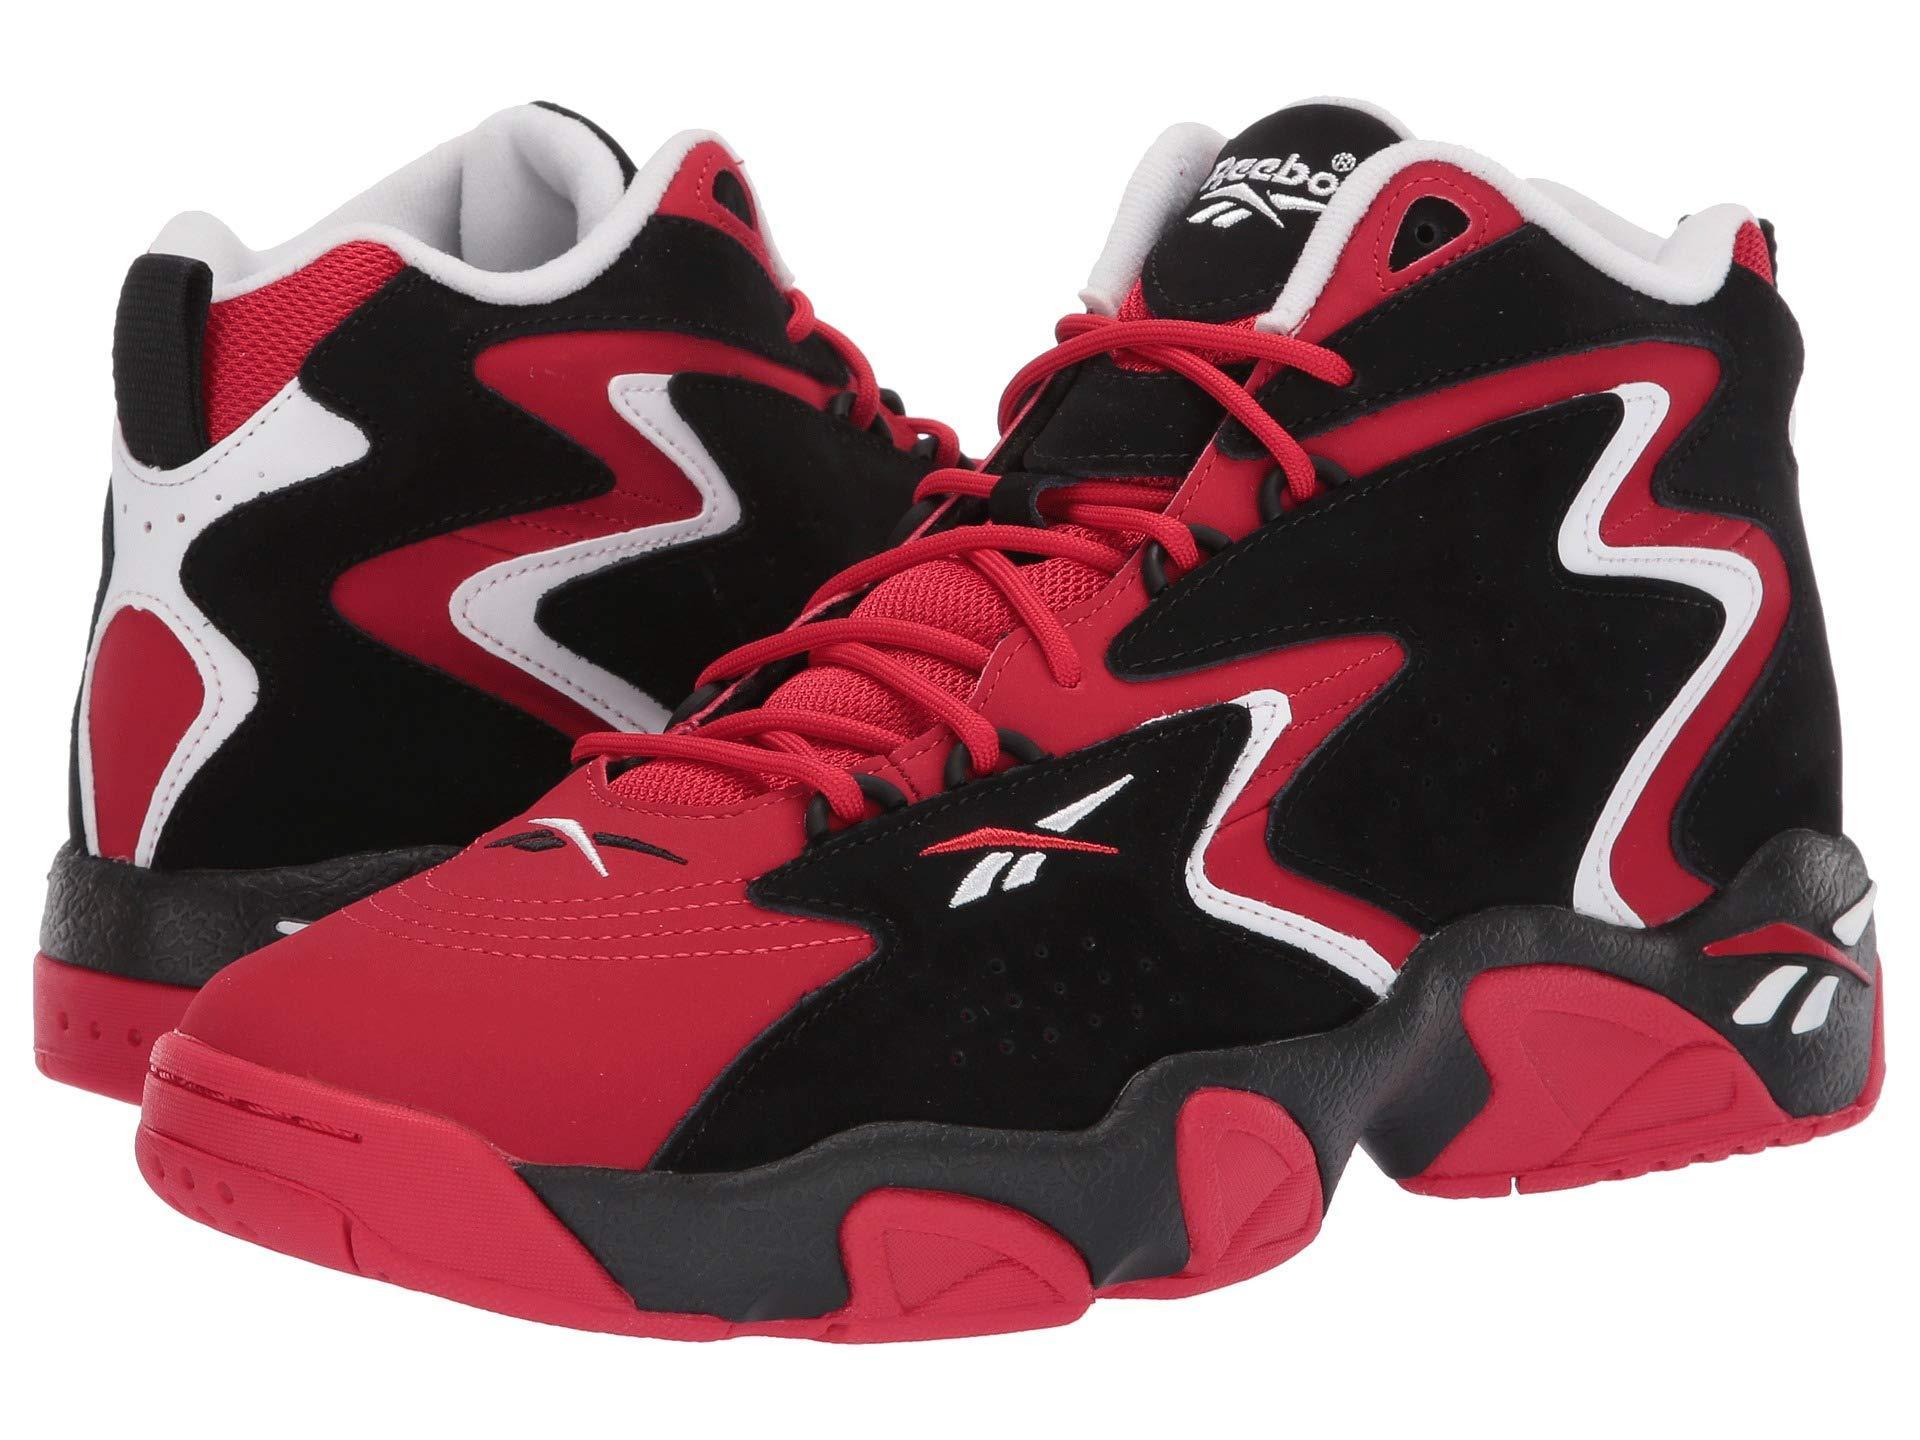 0f6e4873247c Lyst - Reebok Mobius Og Mu (two-tone Scarlet white) Men s Shoes in ...